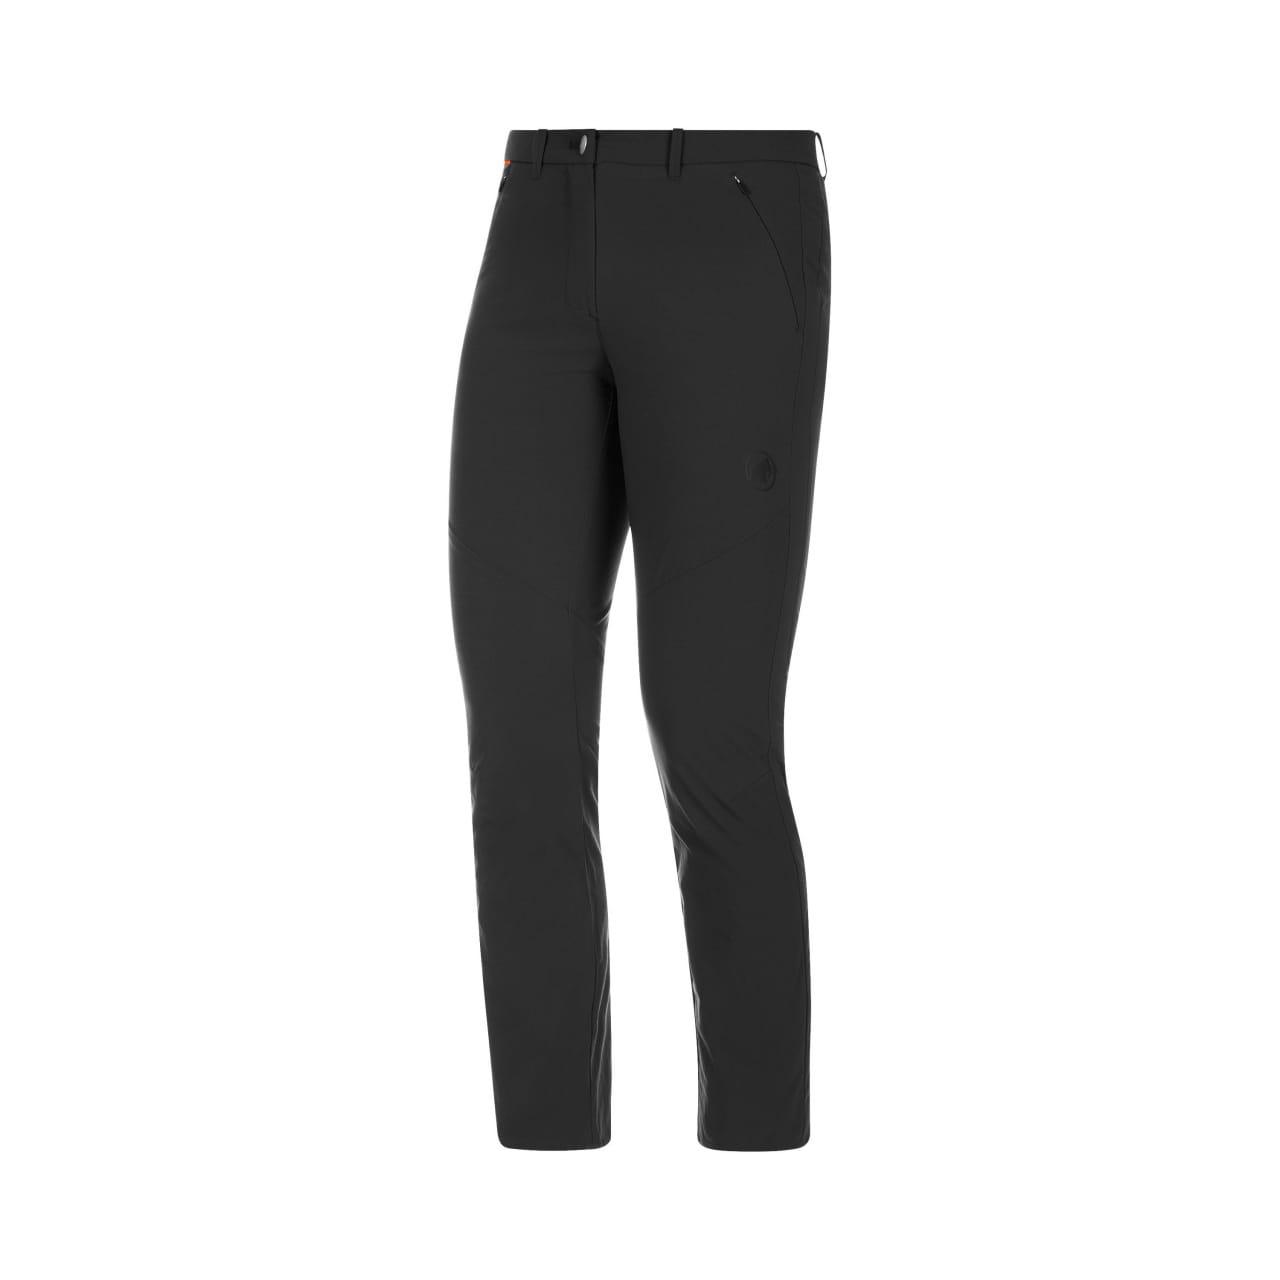 Dámské kalhoty Mammut Hiking Pants RG Women